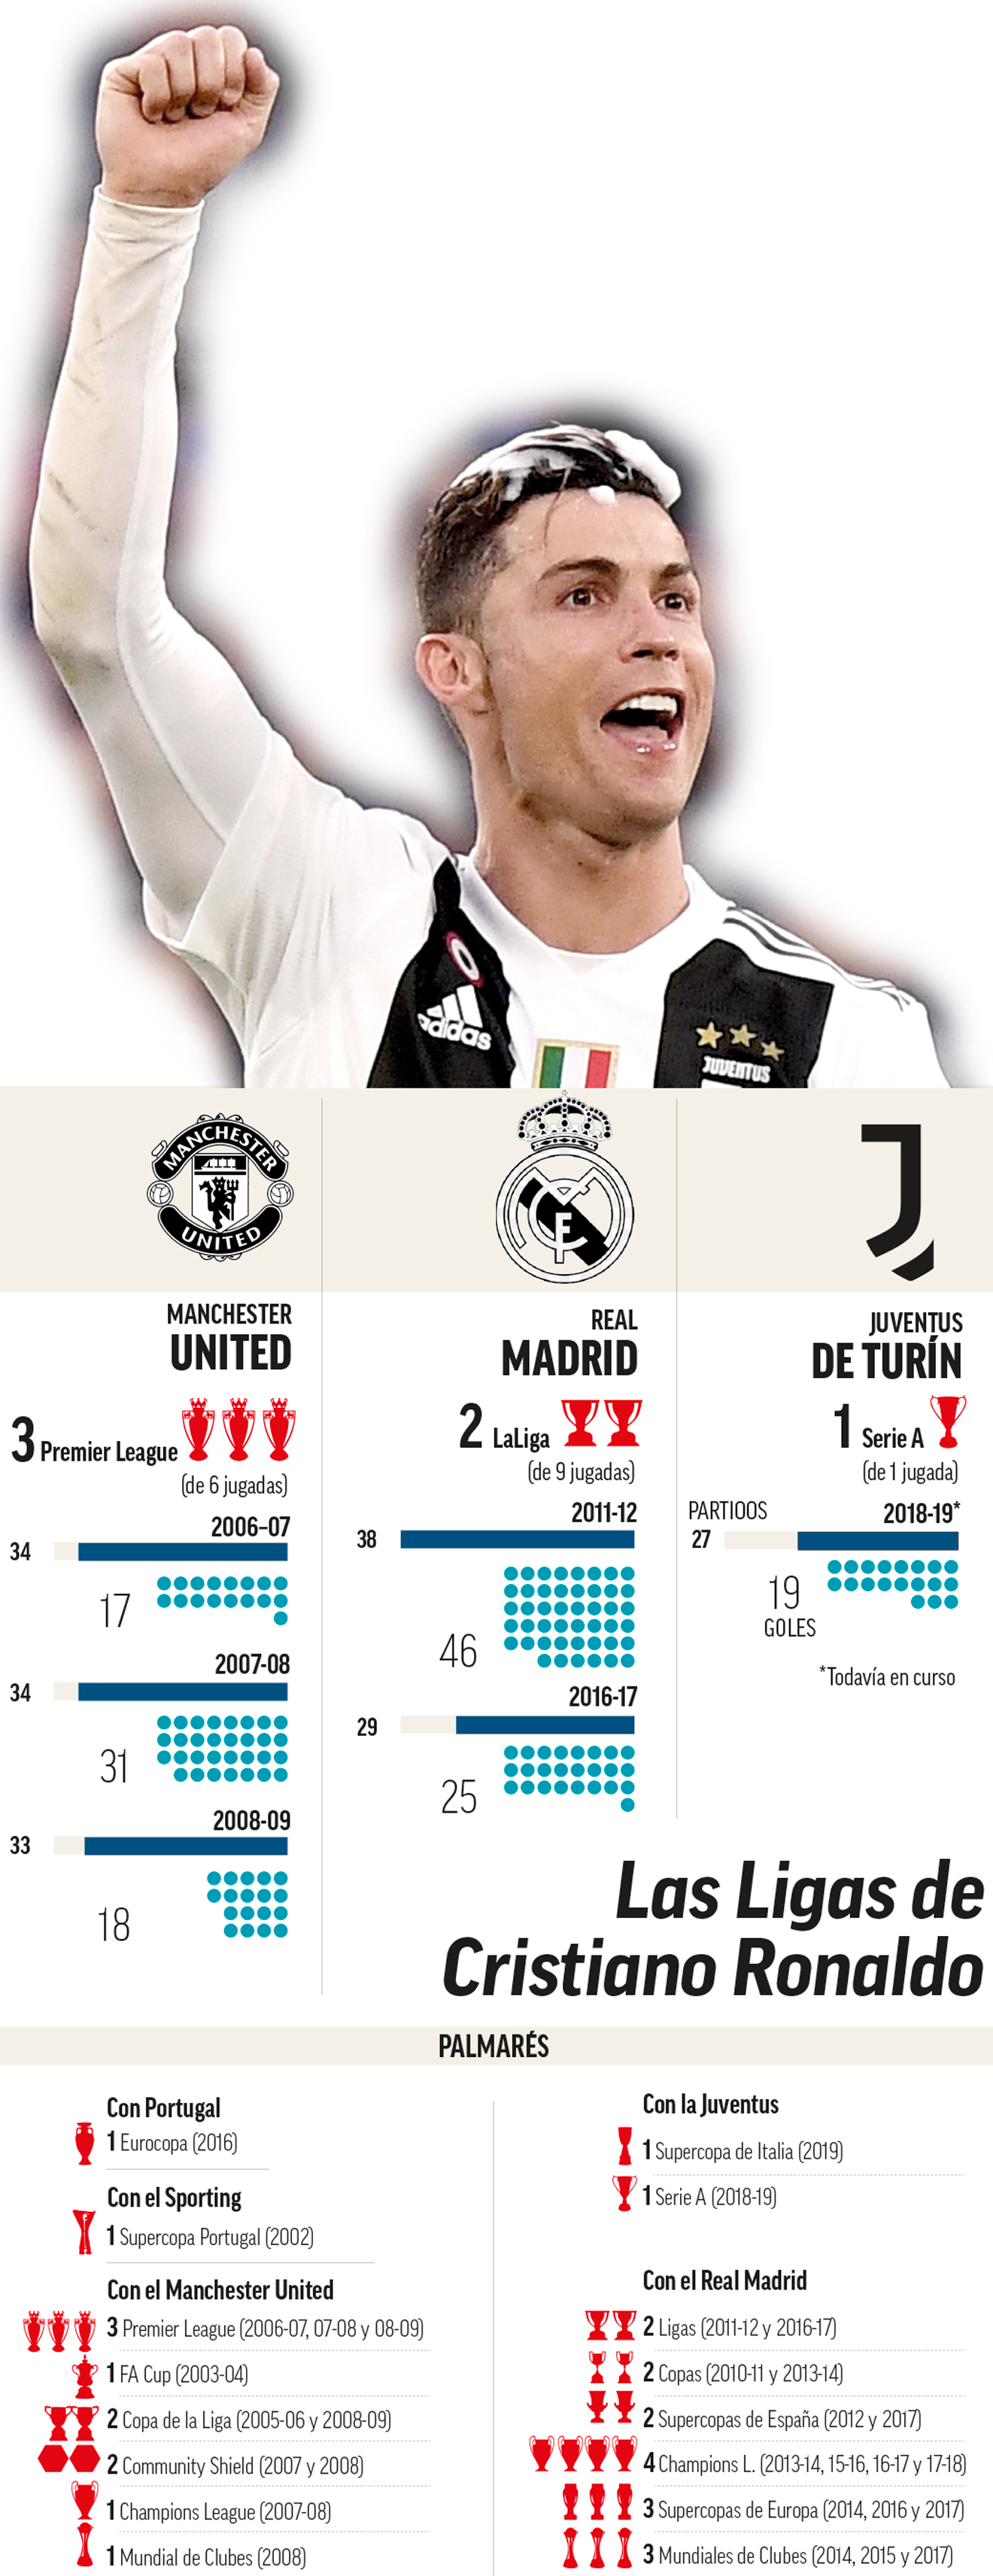 Las Ligas de Cristiano Ronaldo